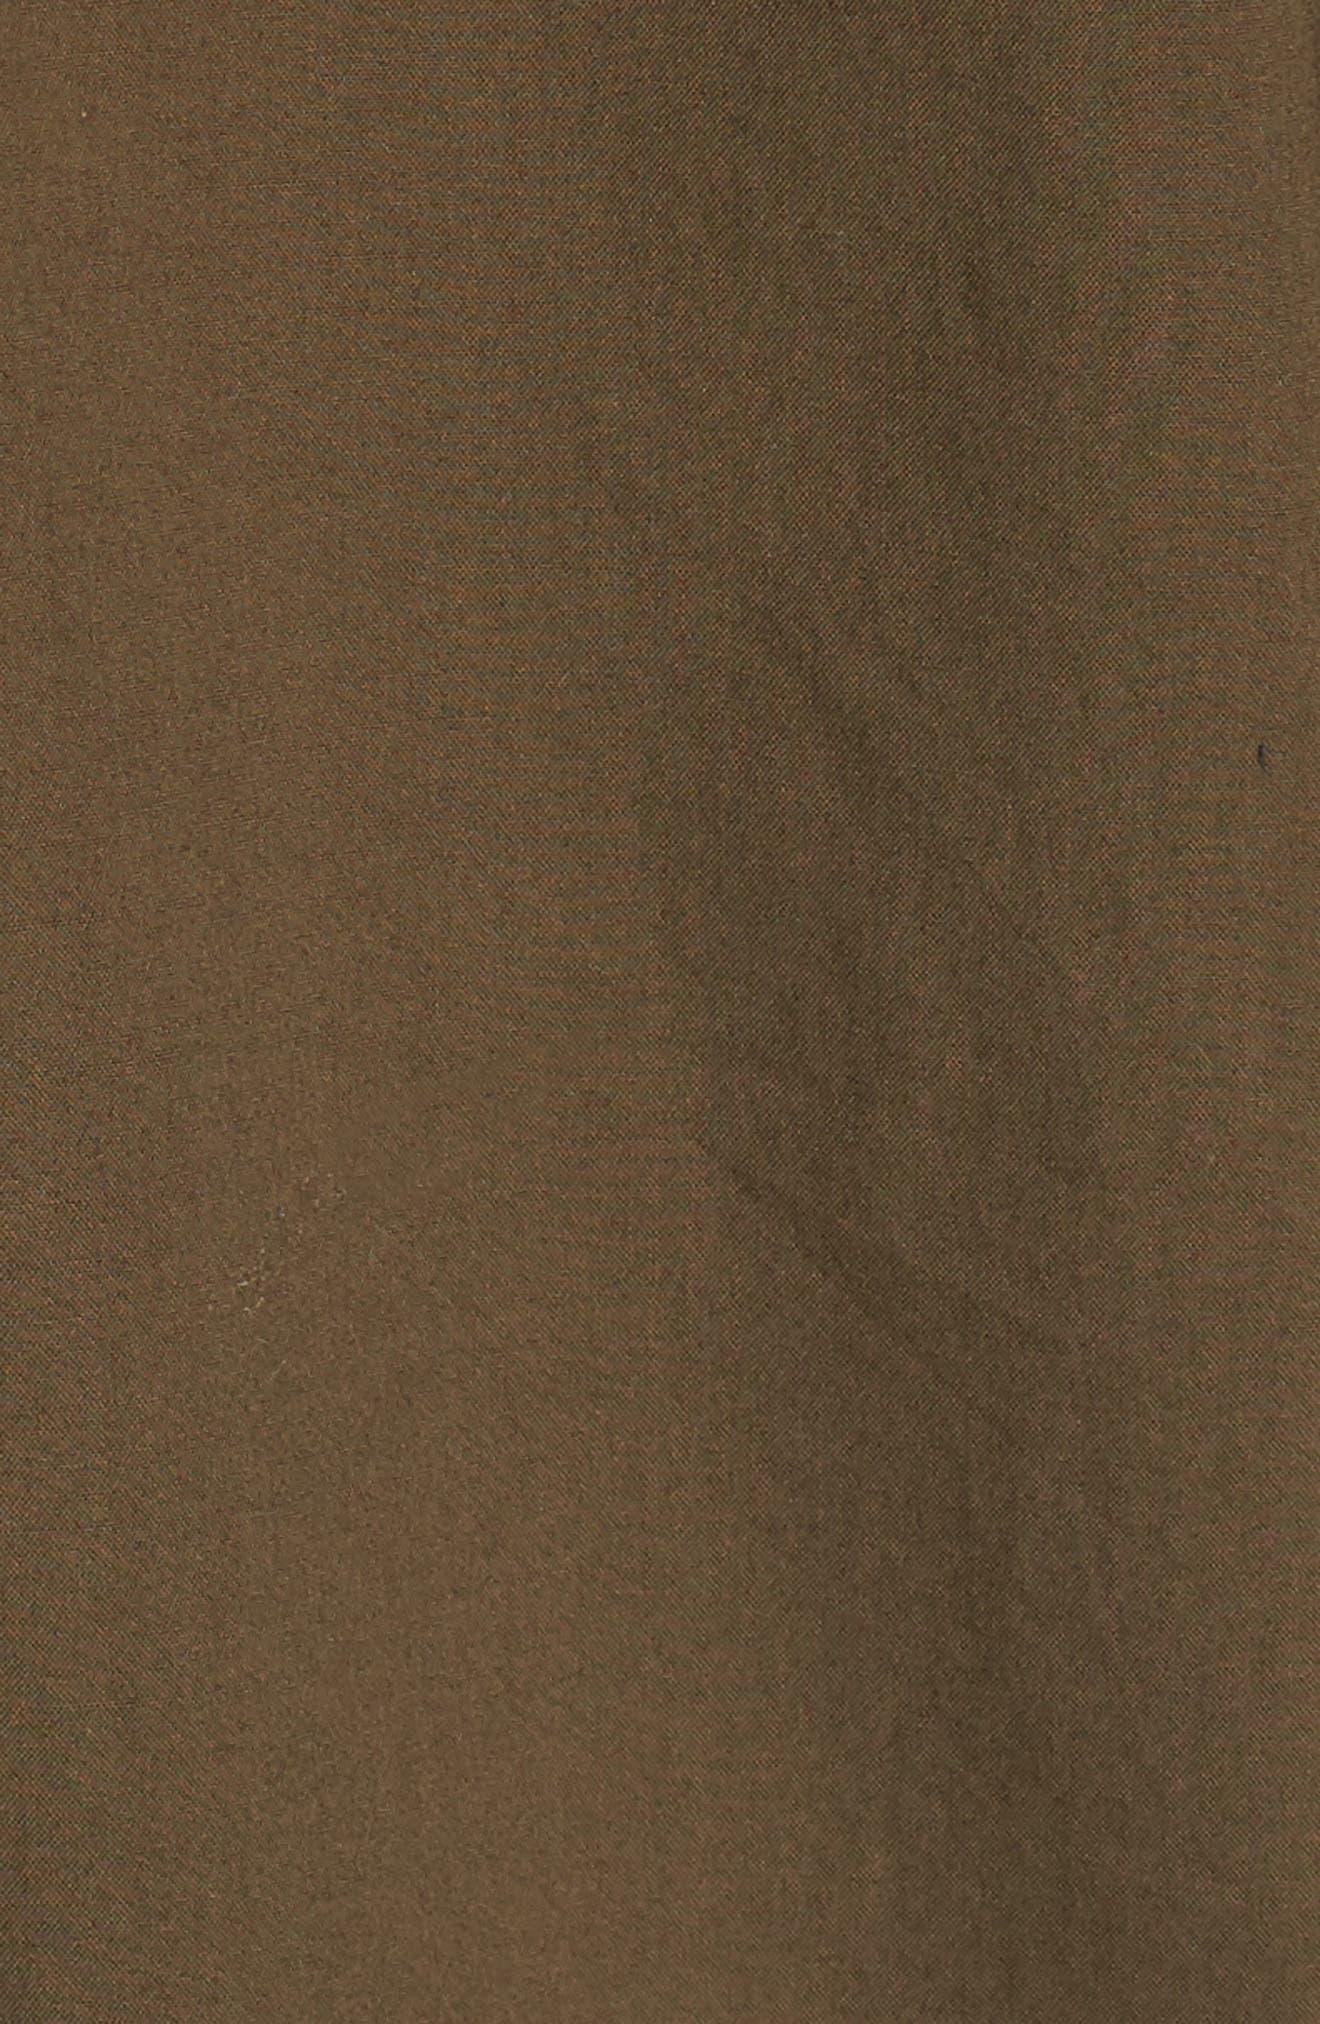 Dolman Sleeve Bomber Jacket,                             Alternate thumbnail 10, color,